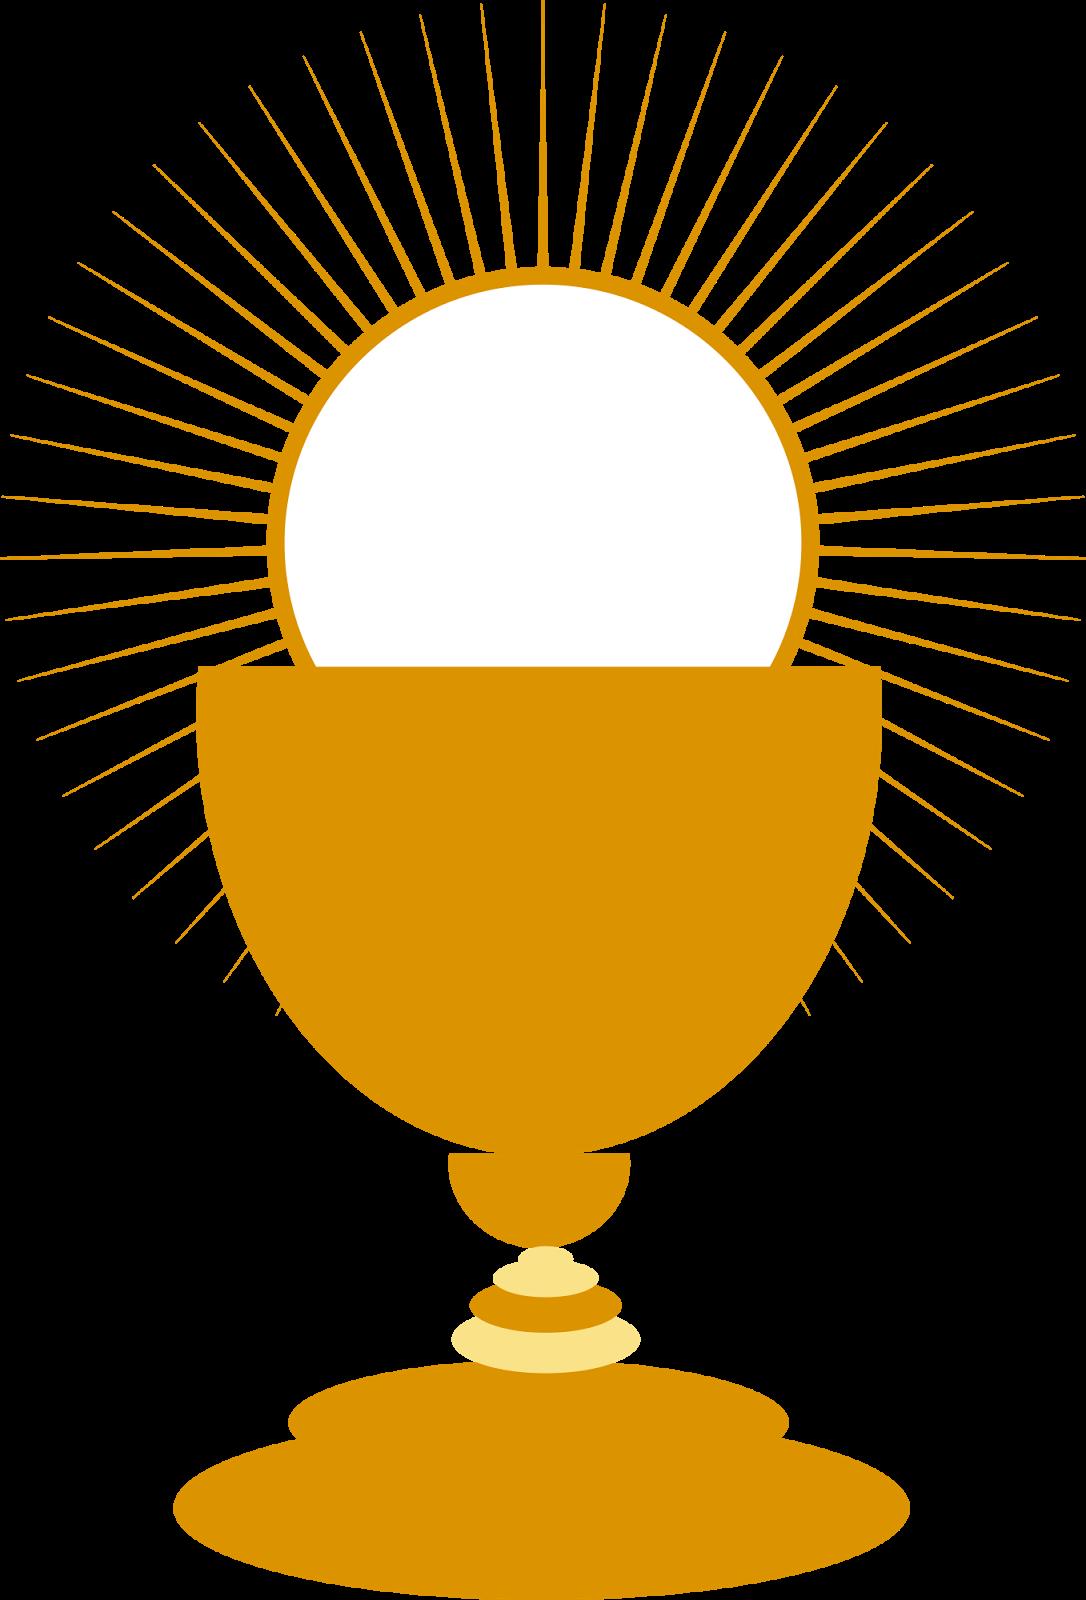 clipart de nenas en su primera comuni u00f3n oh my primera free clipart for first holy communion first holy communion clip art black and white